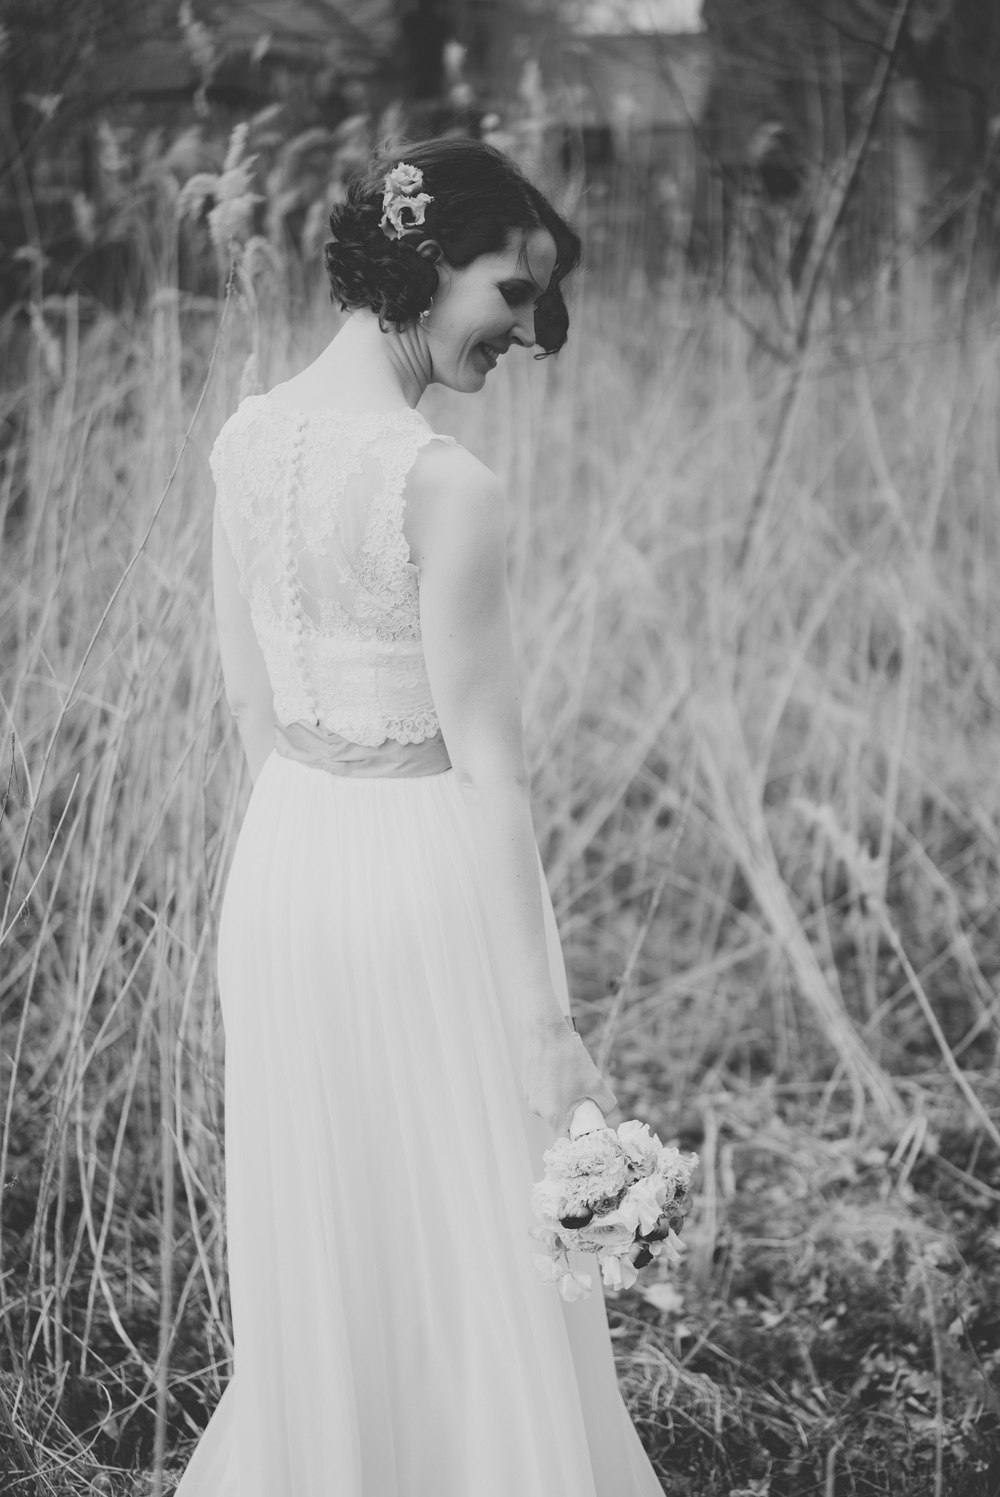 Hochzeitsfotograf-Schlossruine-Hertefeld-Weeze-030.jpg